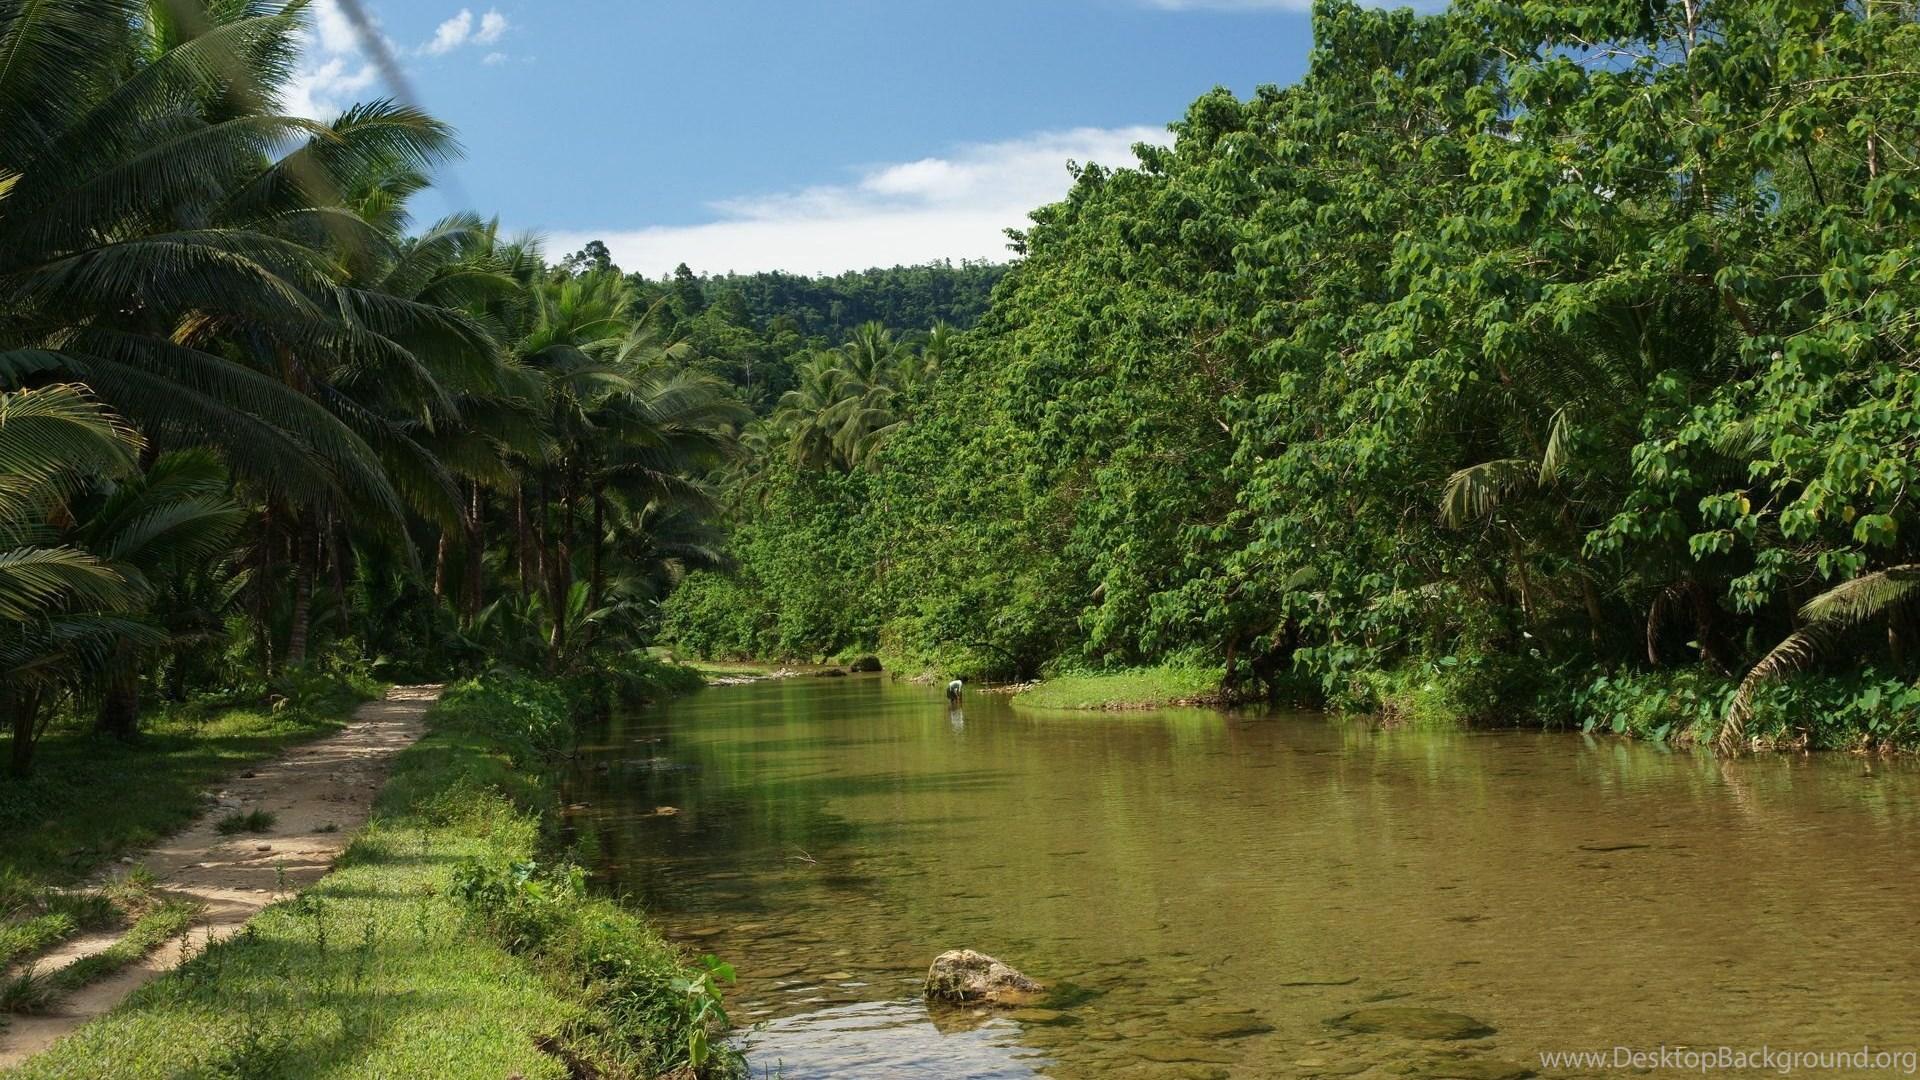 Jungle River HD Wallpapers Desktop Background